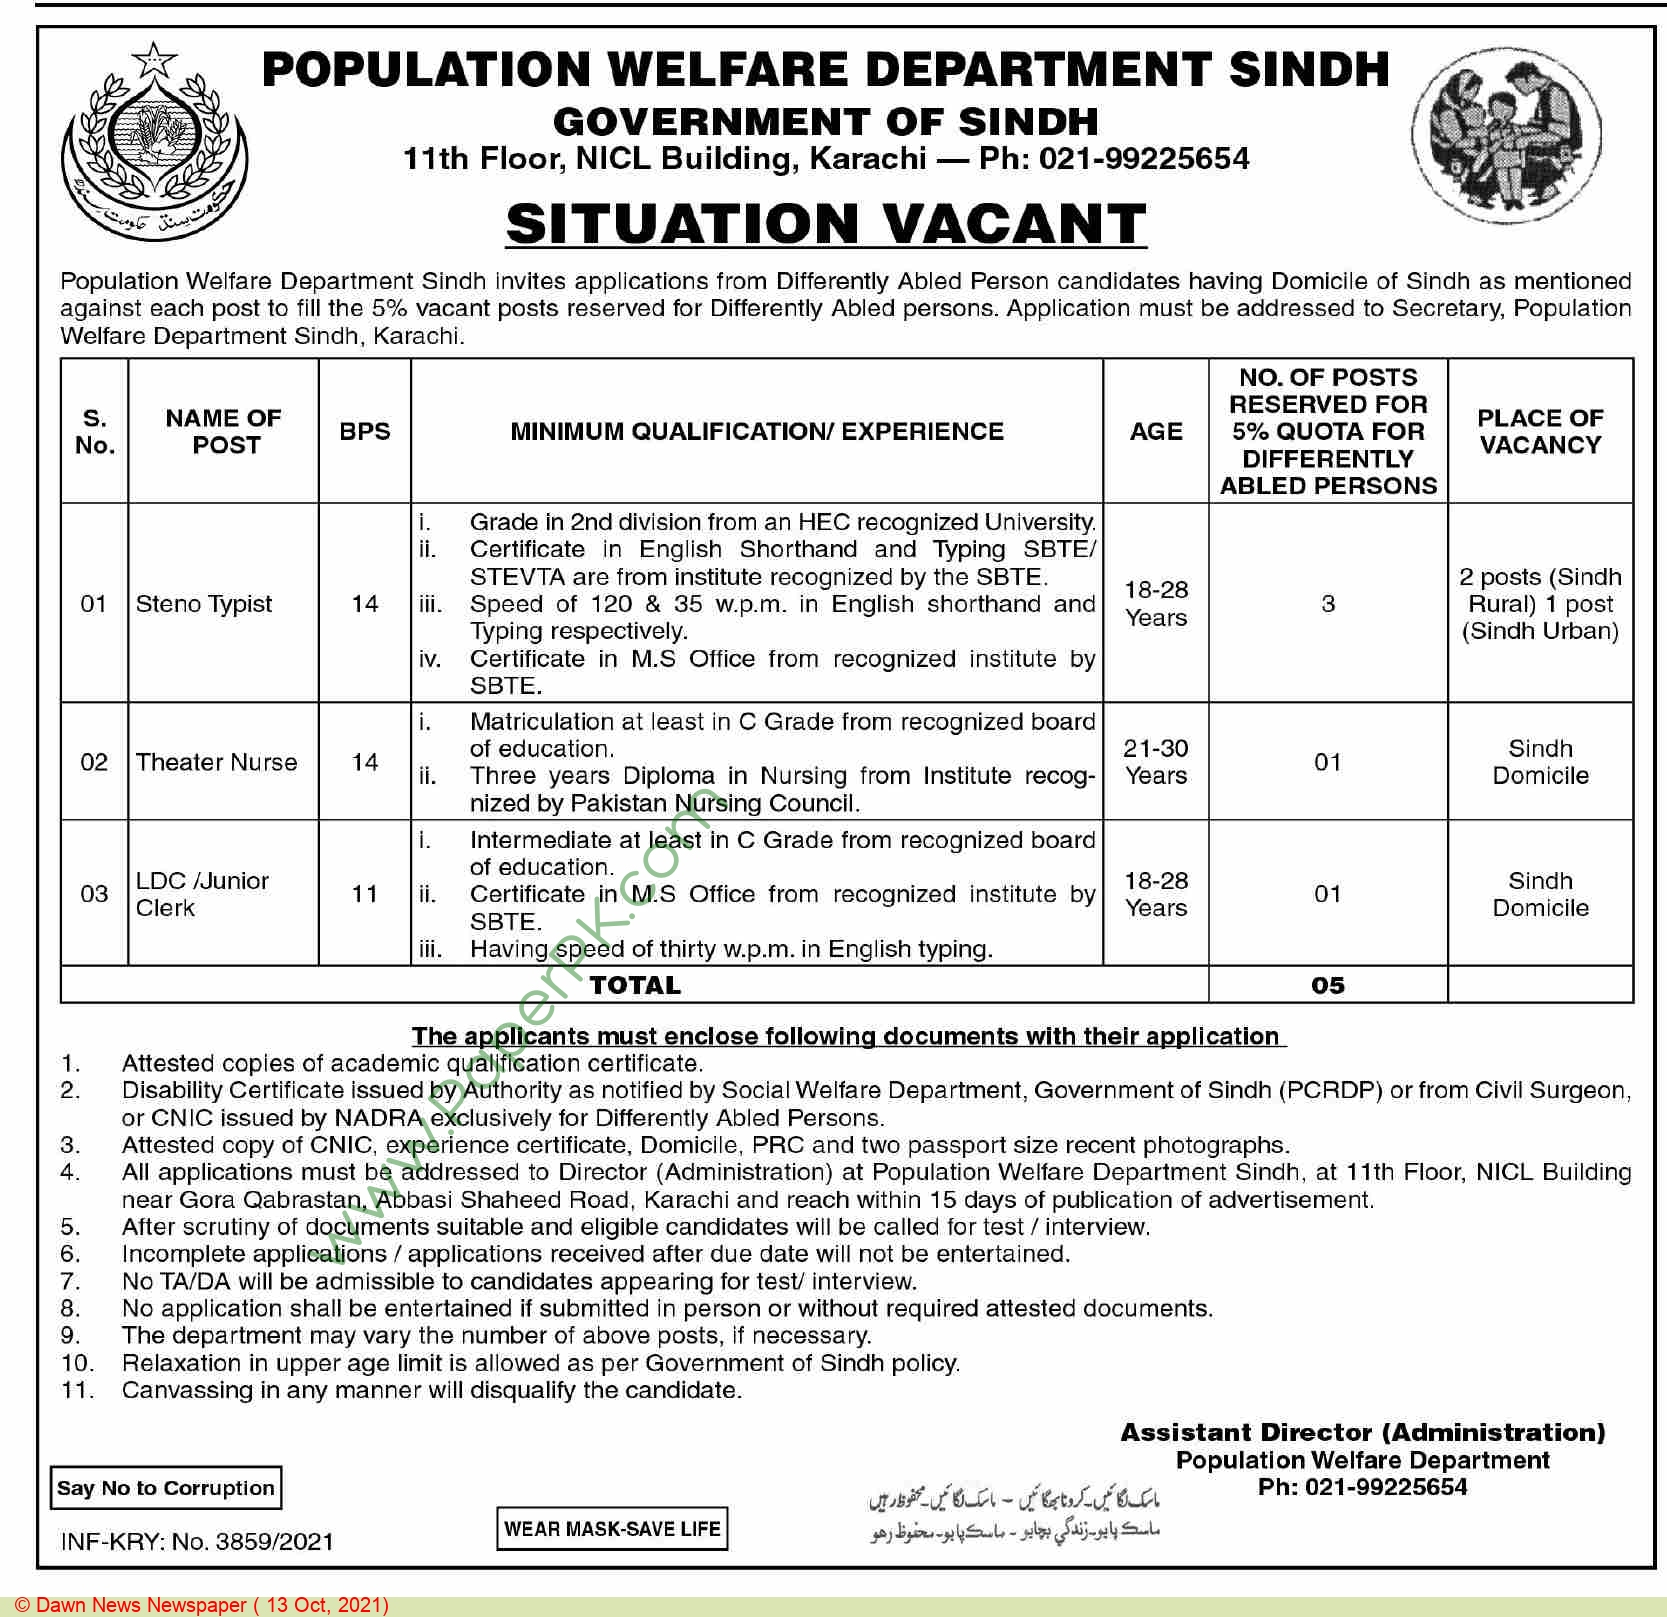 Population Welfare Department jobs newspaper ad for Lower Division Clerk in Karachi on 2021-10-13